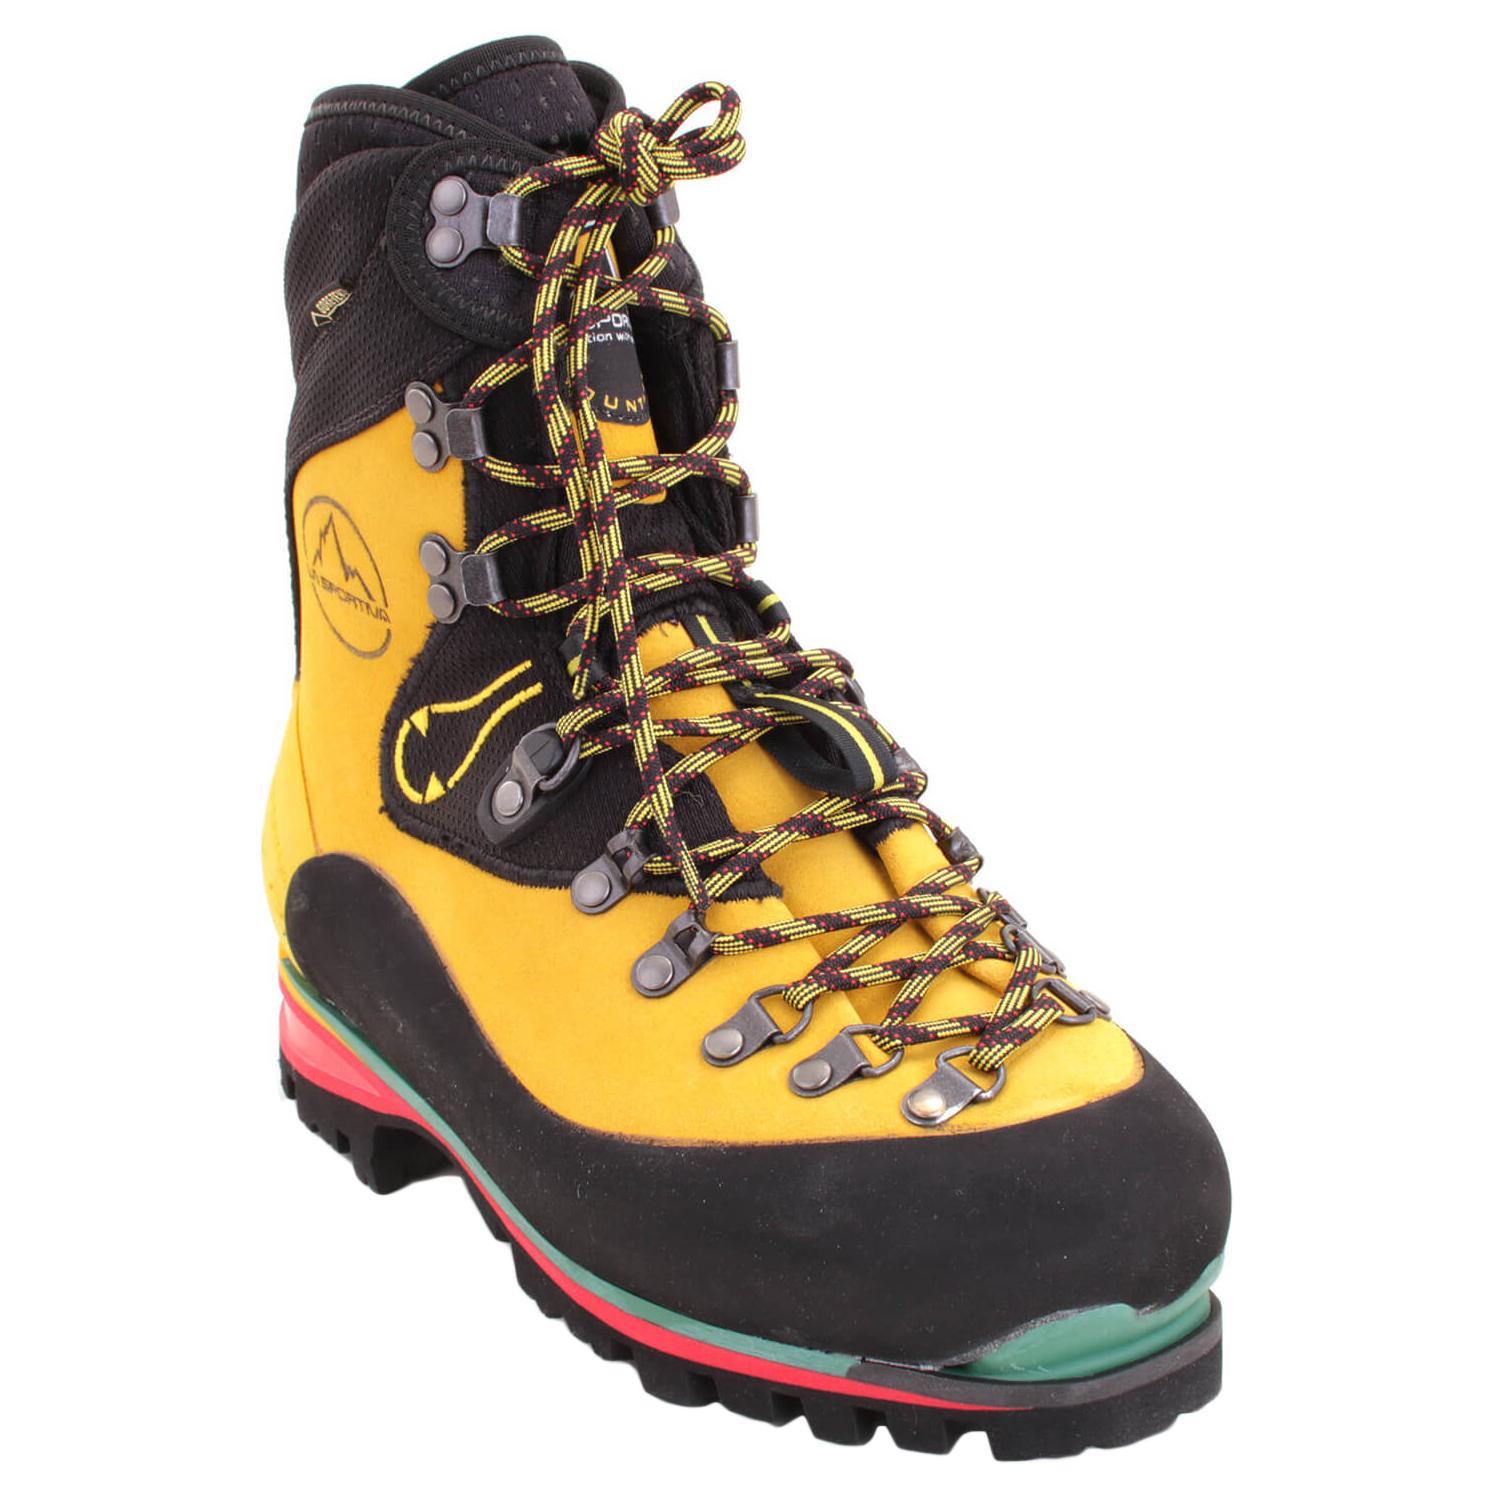 8cf9c204 La Sportiva - Nepal Evo GTX - Botas alta montaña - Yellow | 39 (EU)